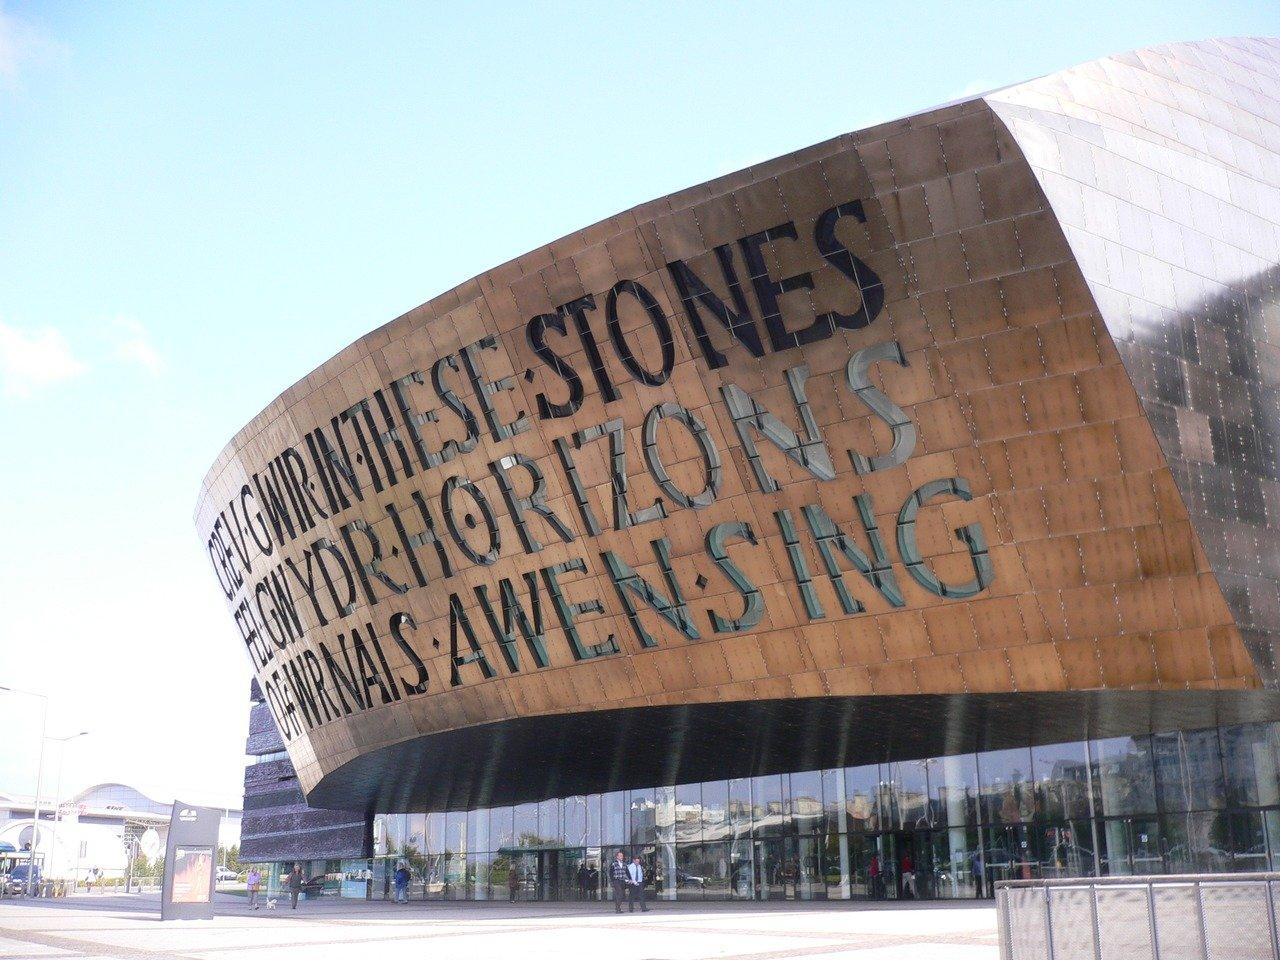 Wales Millennium Centre Cardiff